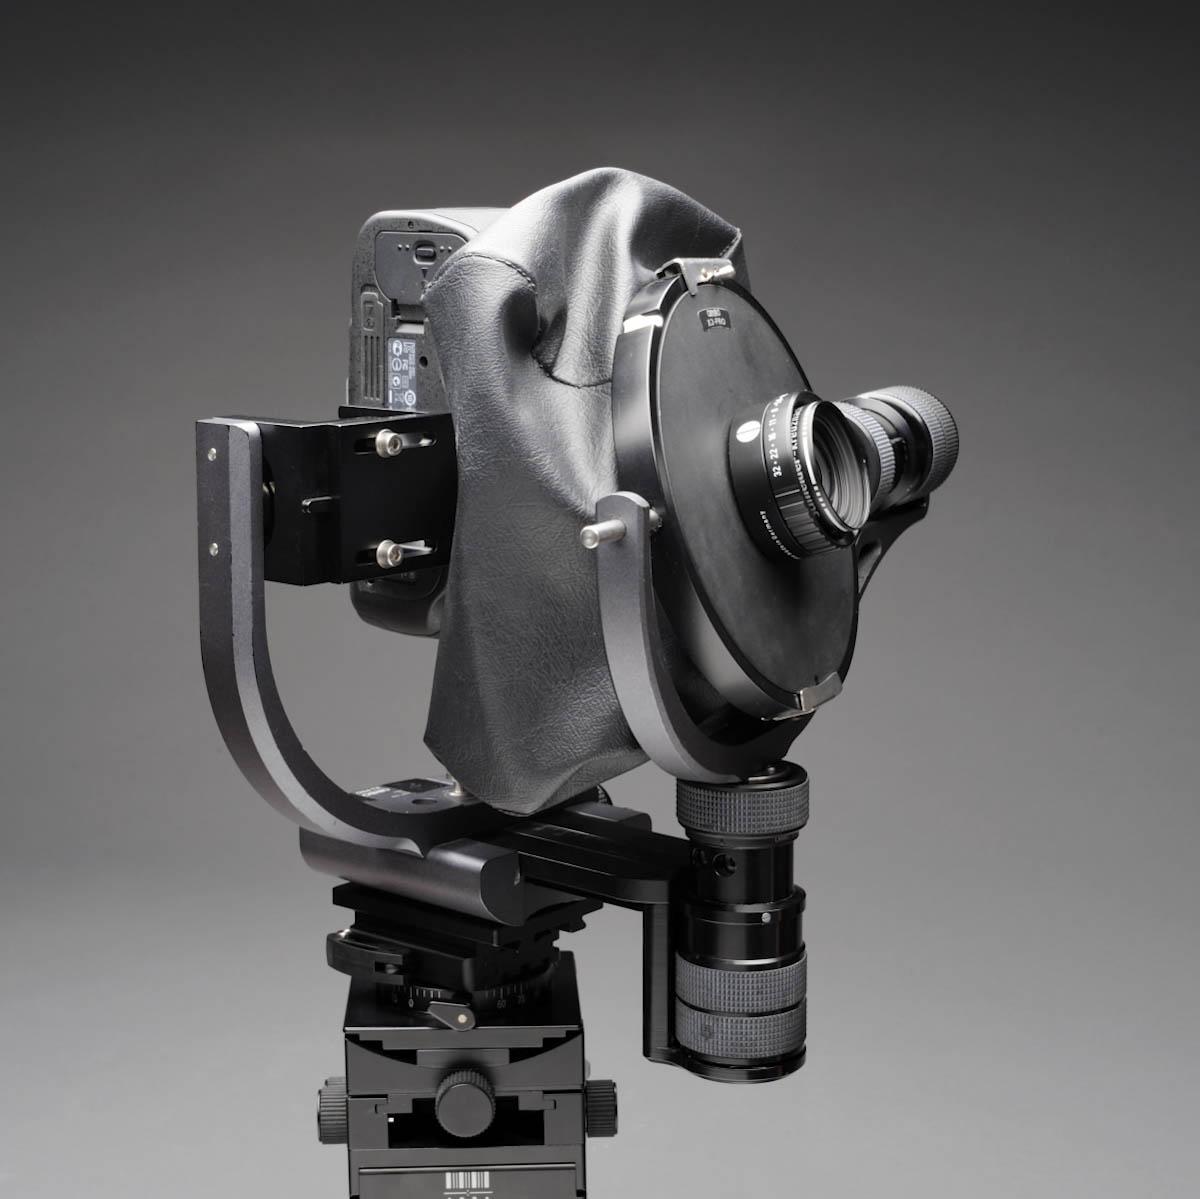 Nikon-D800-Cambo-X2-Pro-Schneider-Kreuznach-APO-90mm-f4.5-13